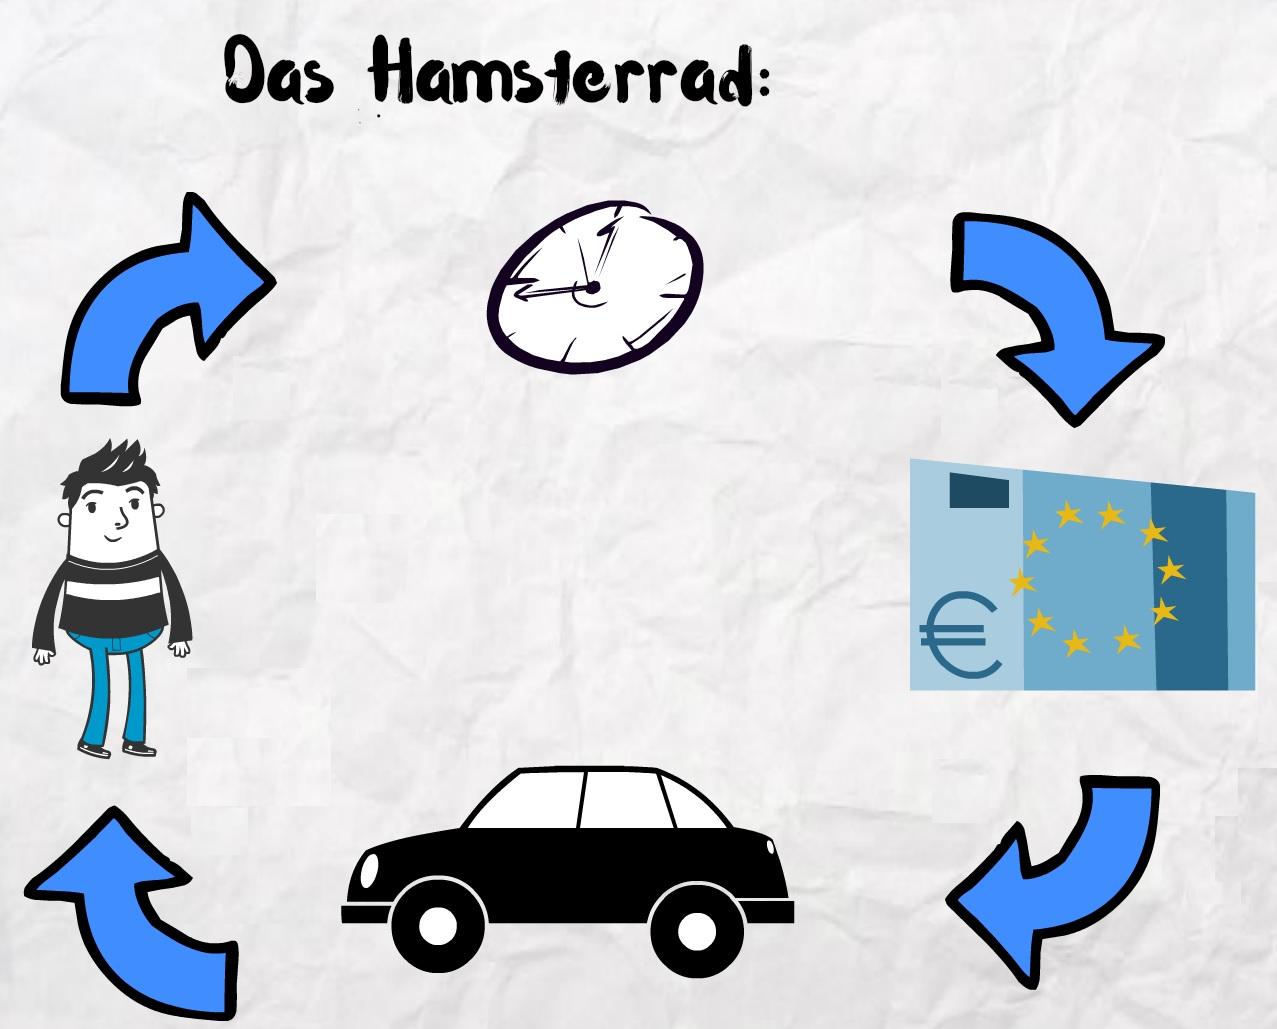 Finanzielles Hamsterrad